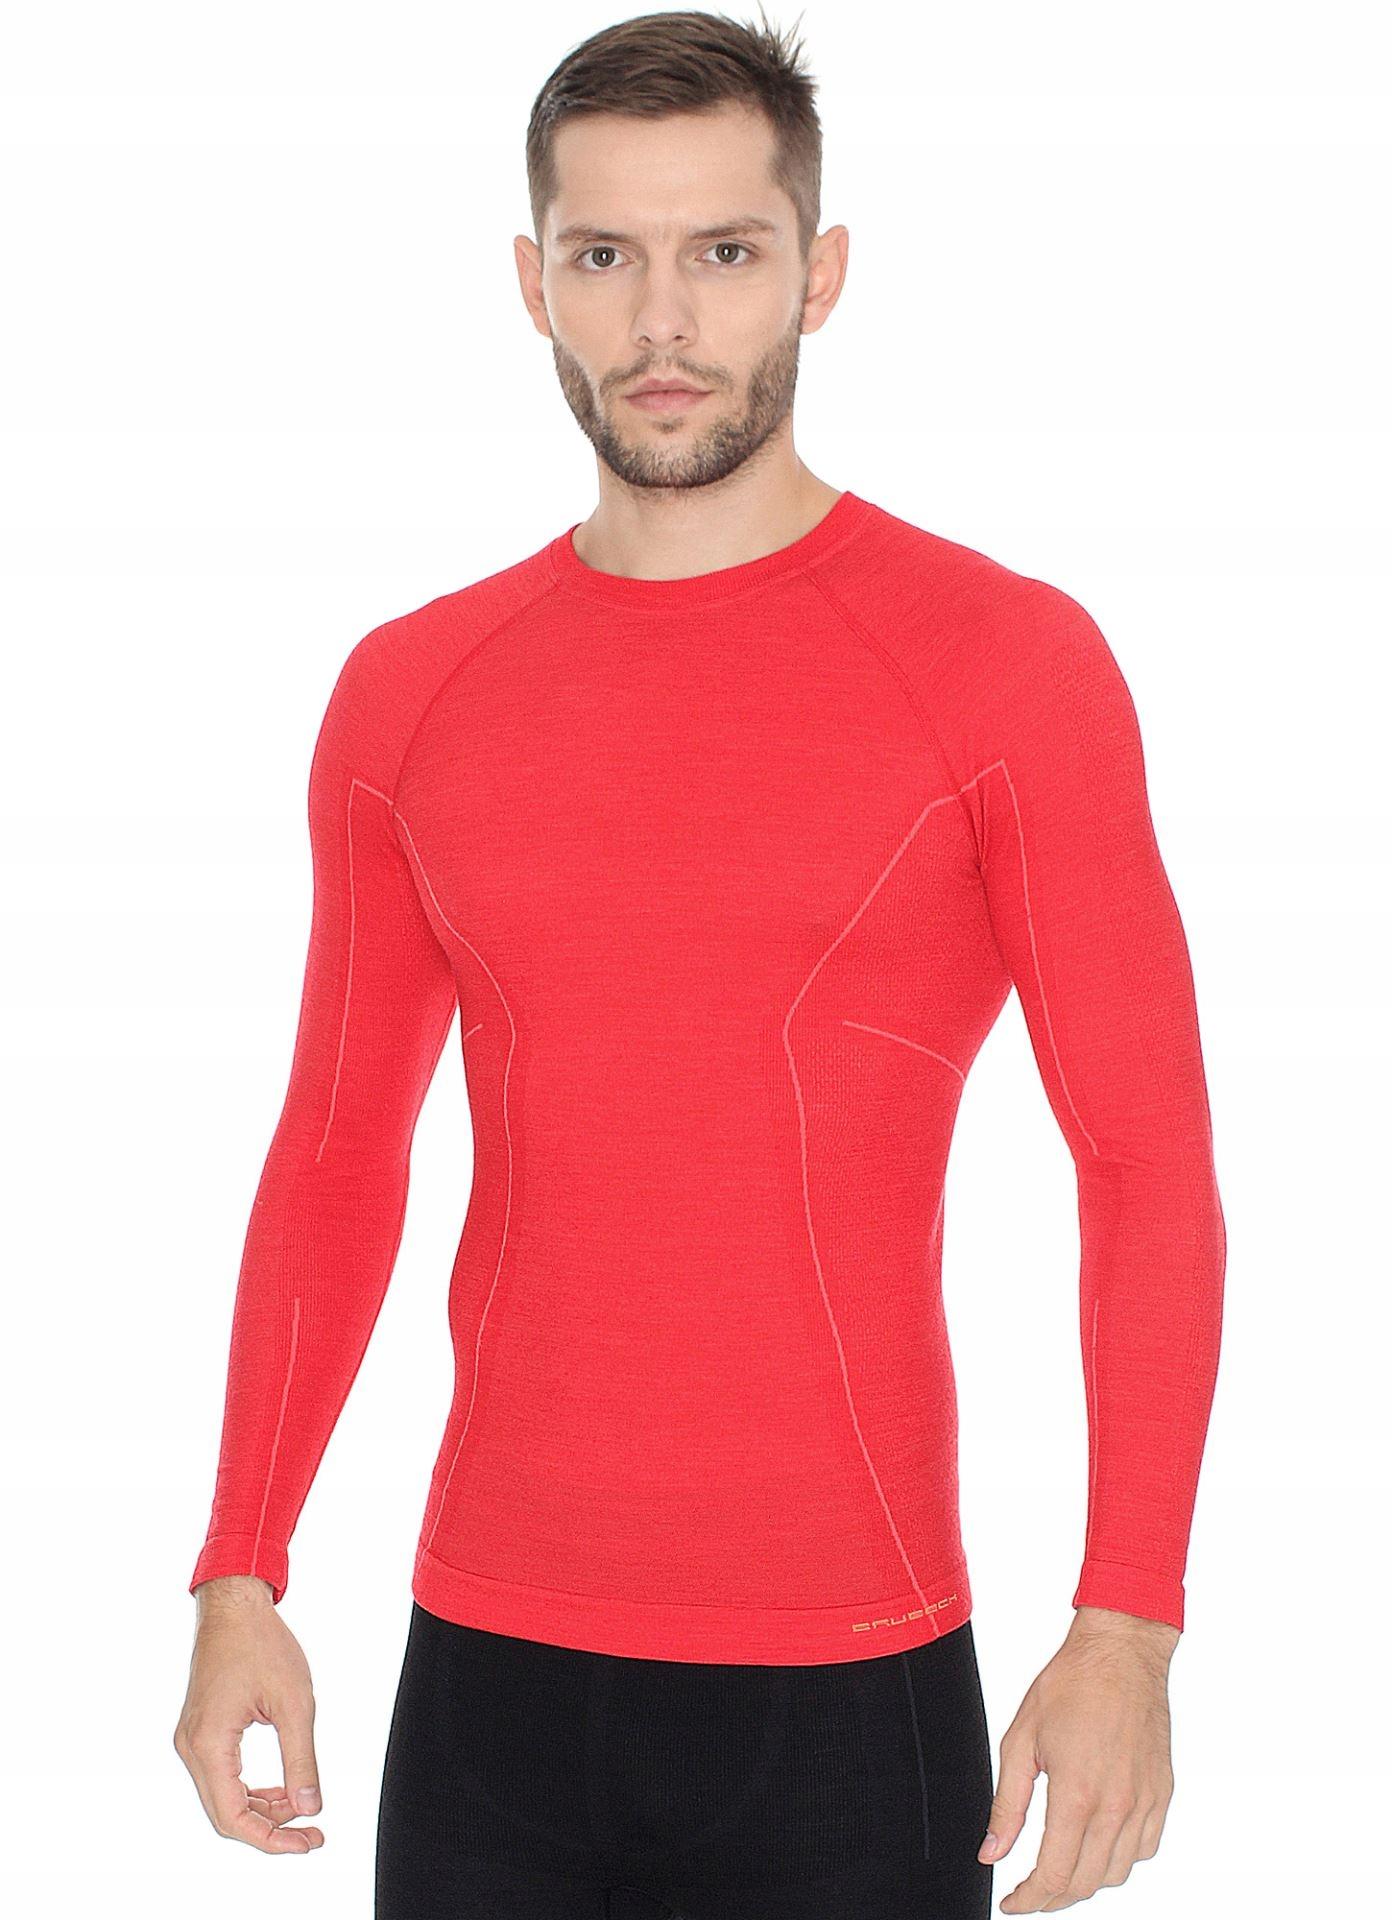 Brubeck koszulka termo ACTIVE WOOL czerwona XL